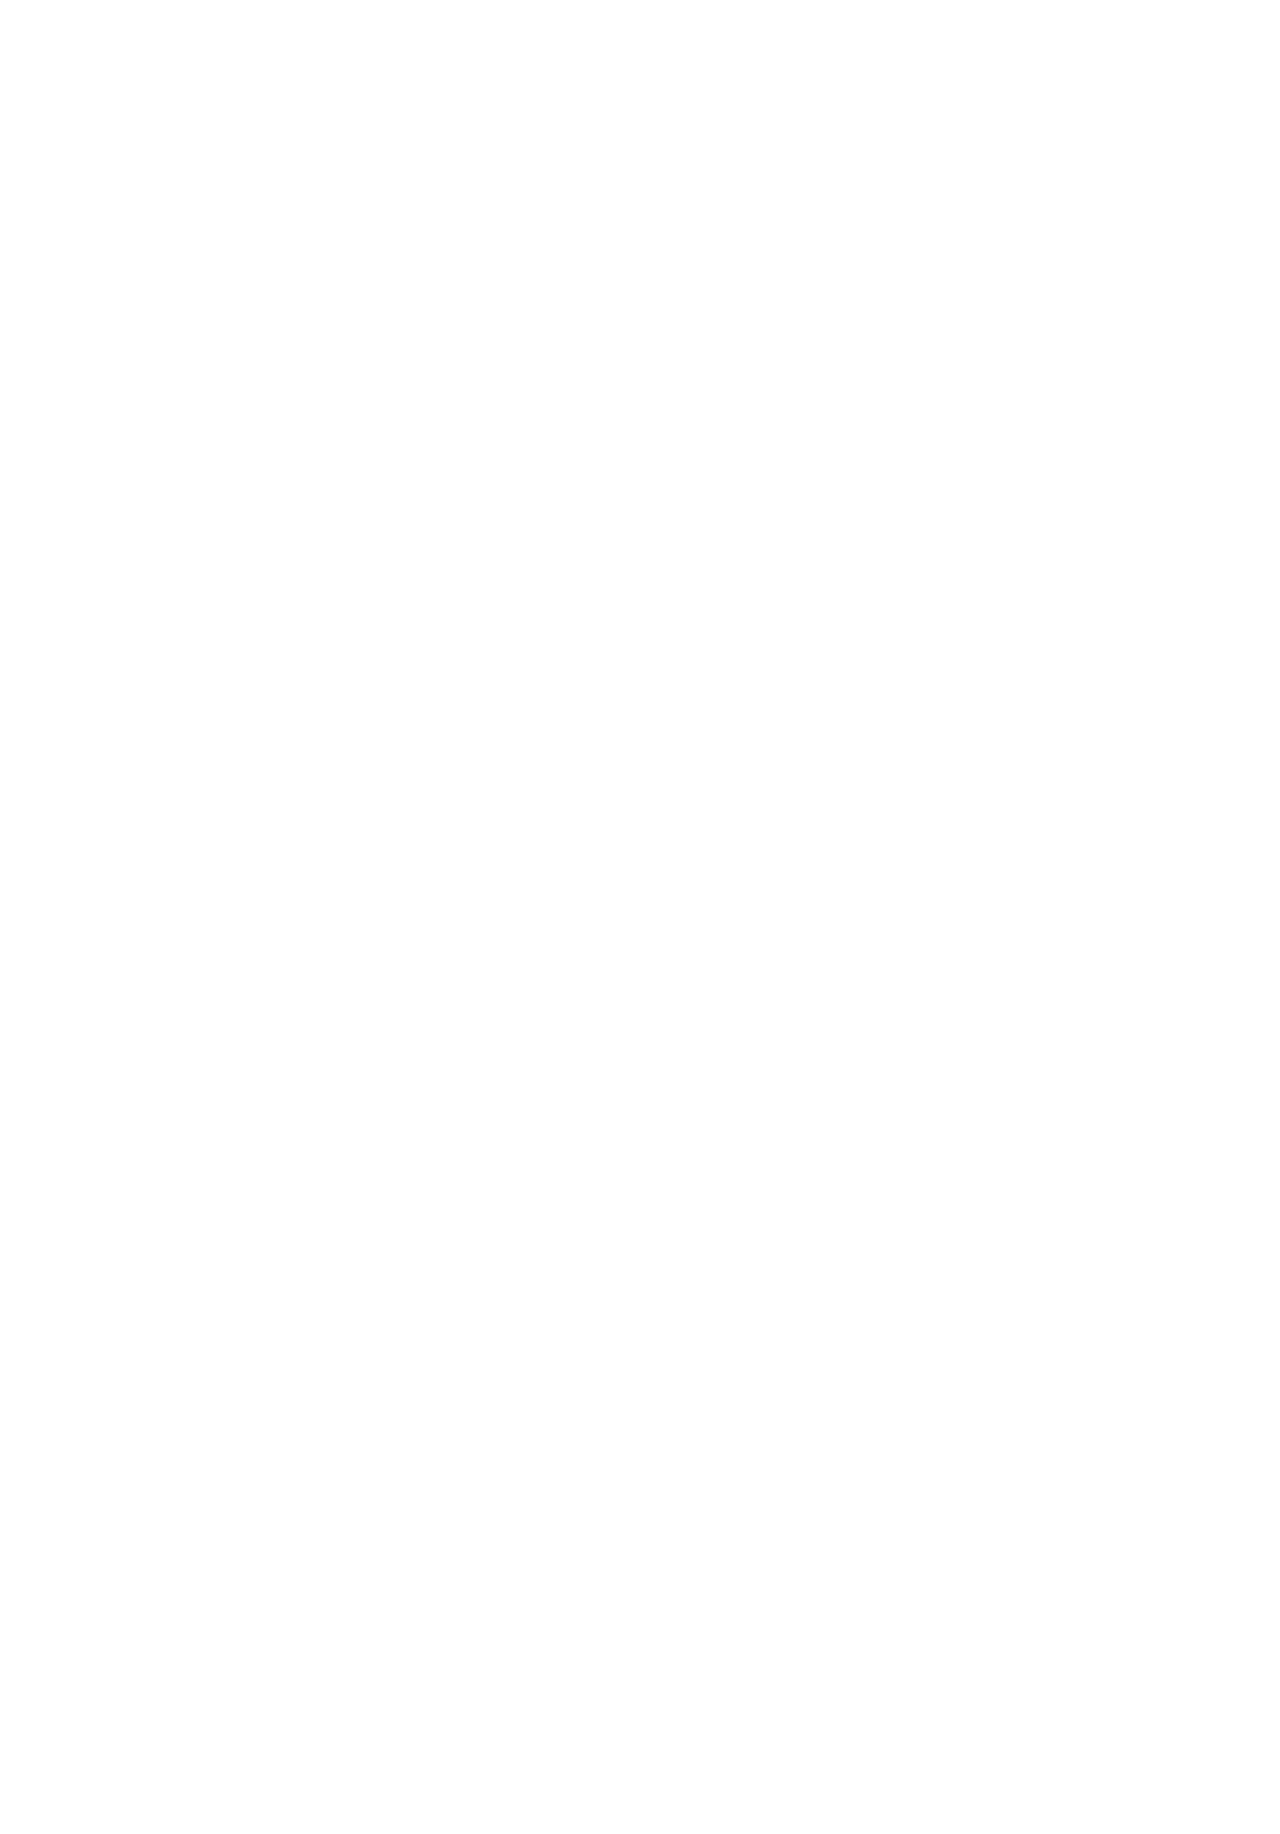 Saimin Seishidou 4: Ninshin Taiken Shidou 92